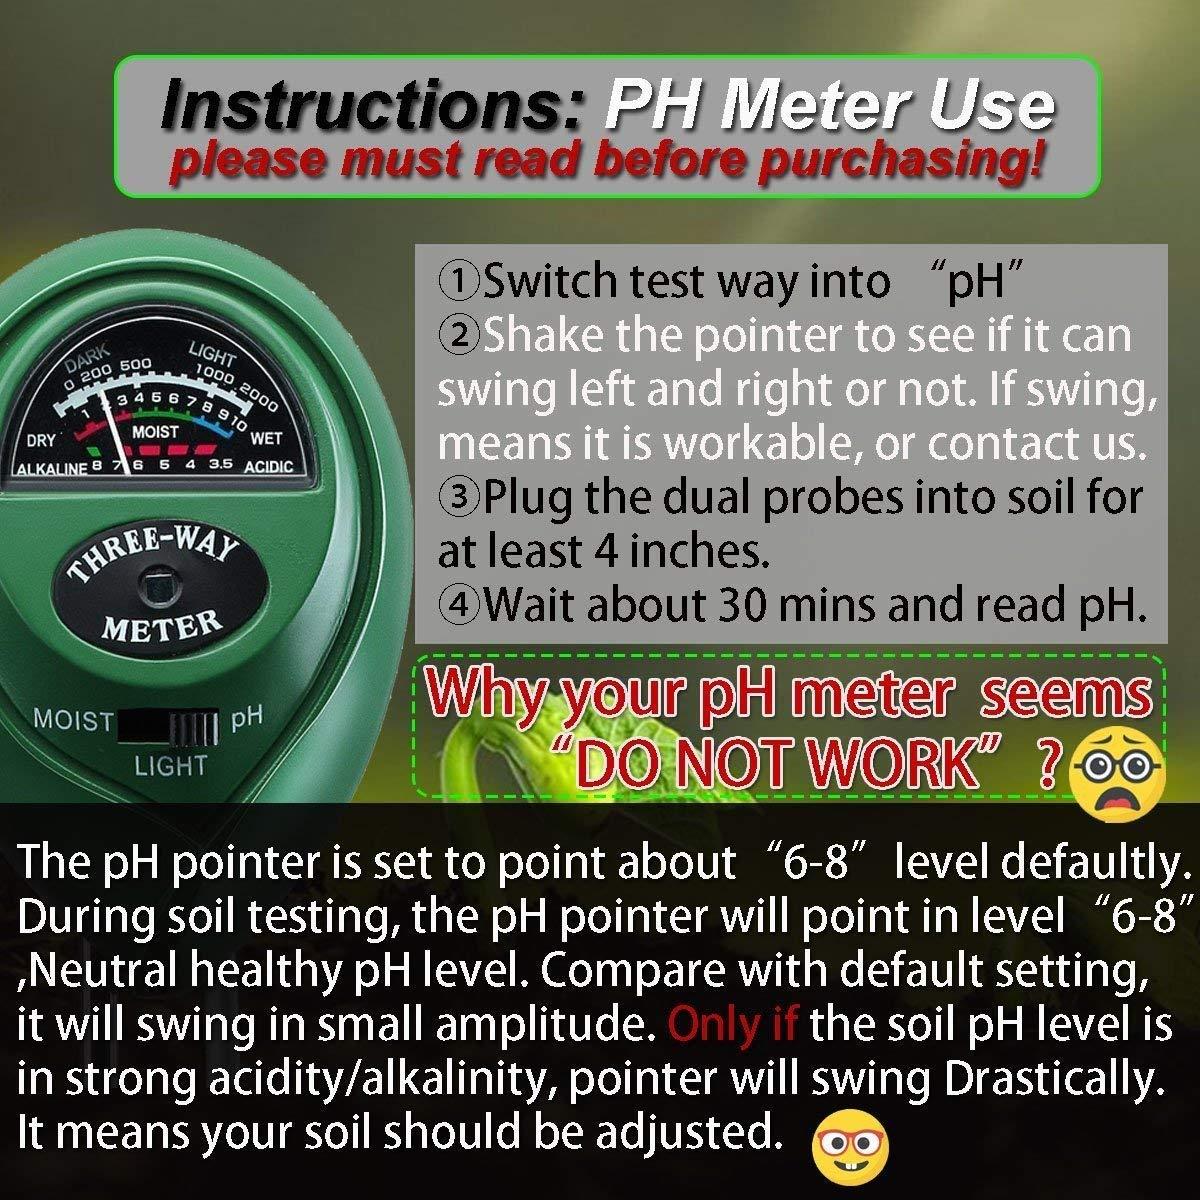 Three-Way Soil Meter For Moisture, Light Intensity and pH Testing Meter (1)